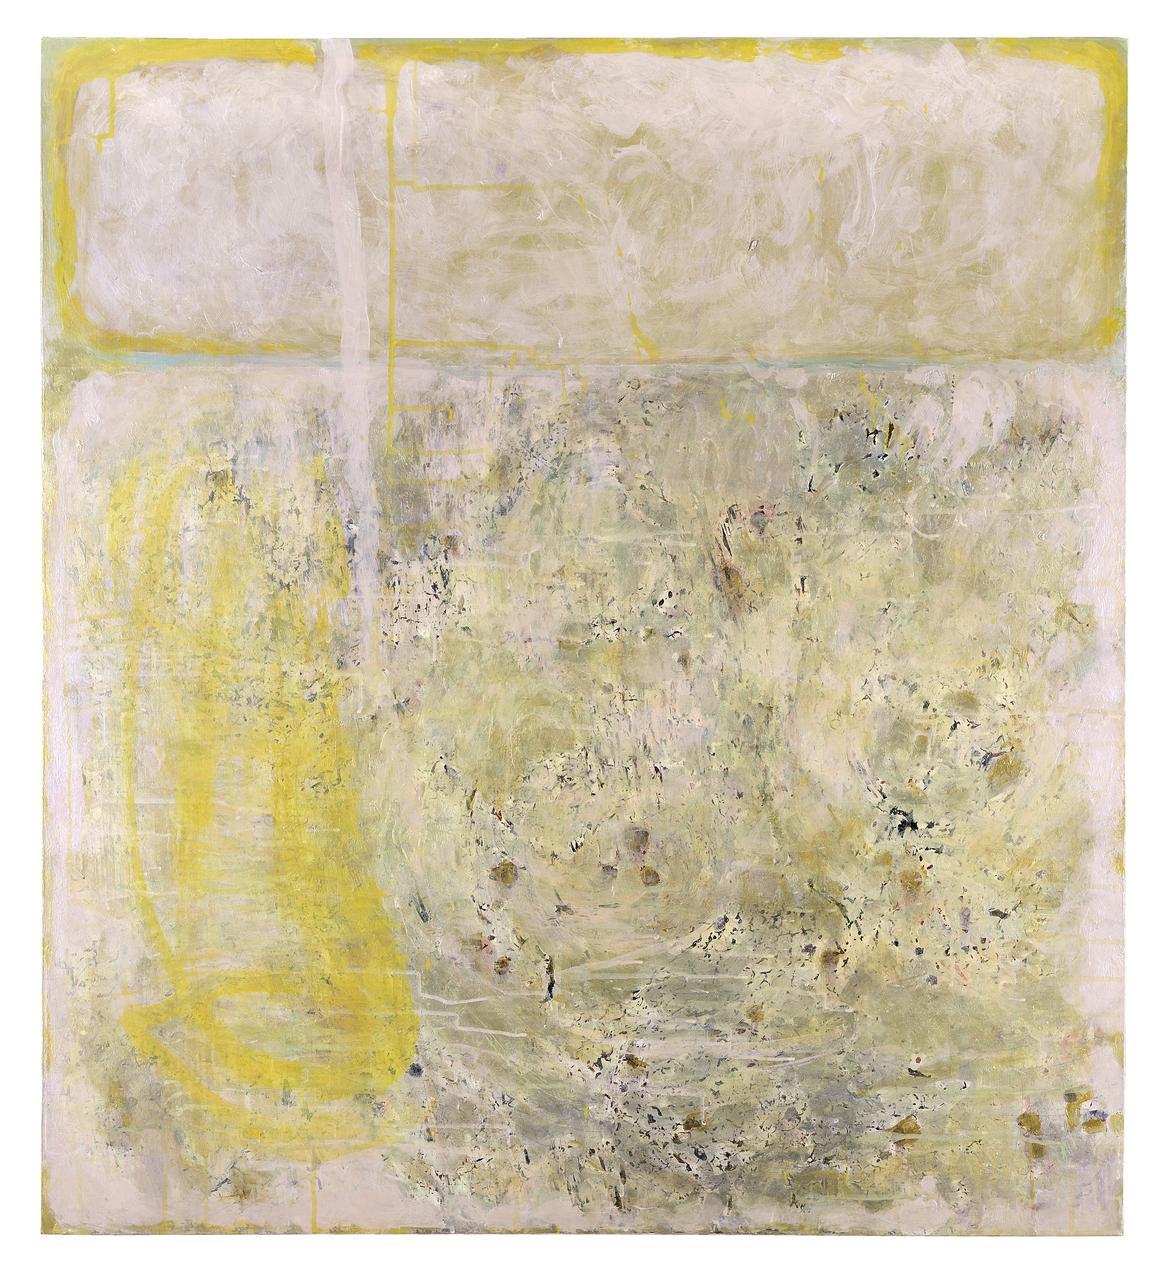 False Memory 1, 2018, acrylics on canvas, 110 x 100 cm